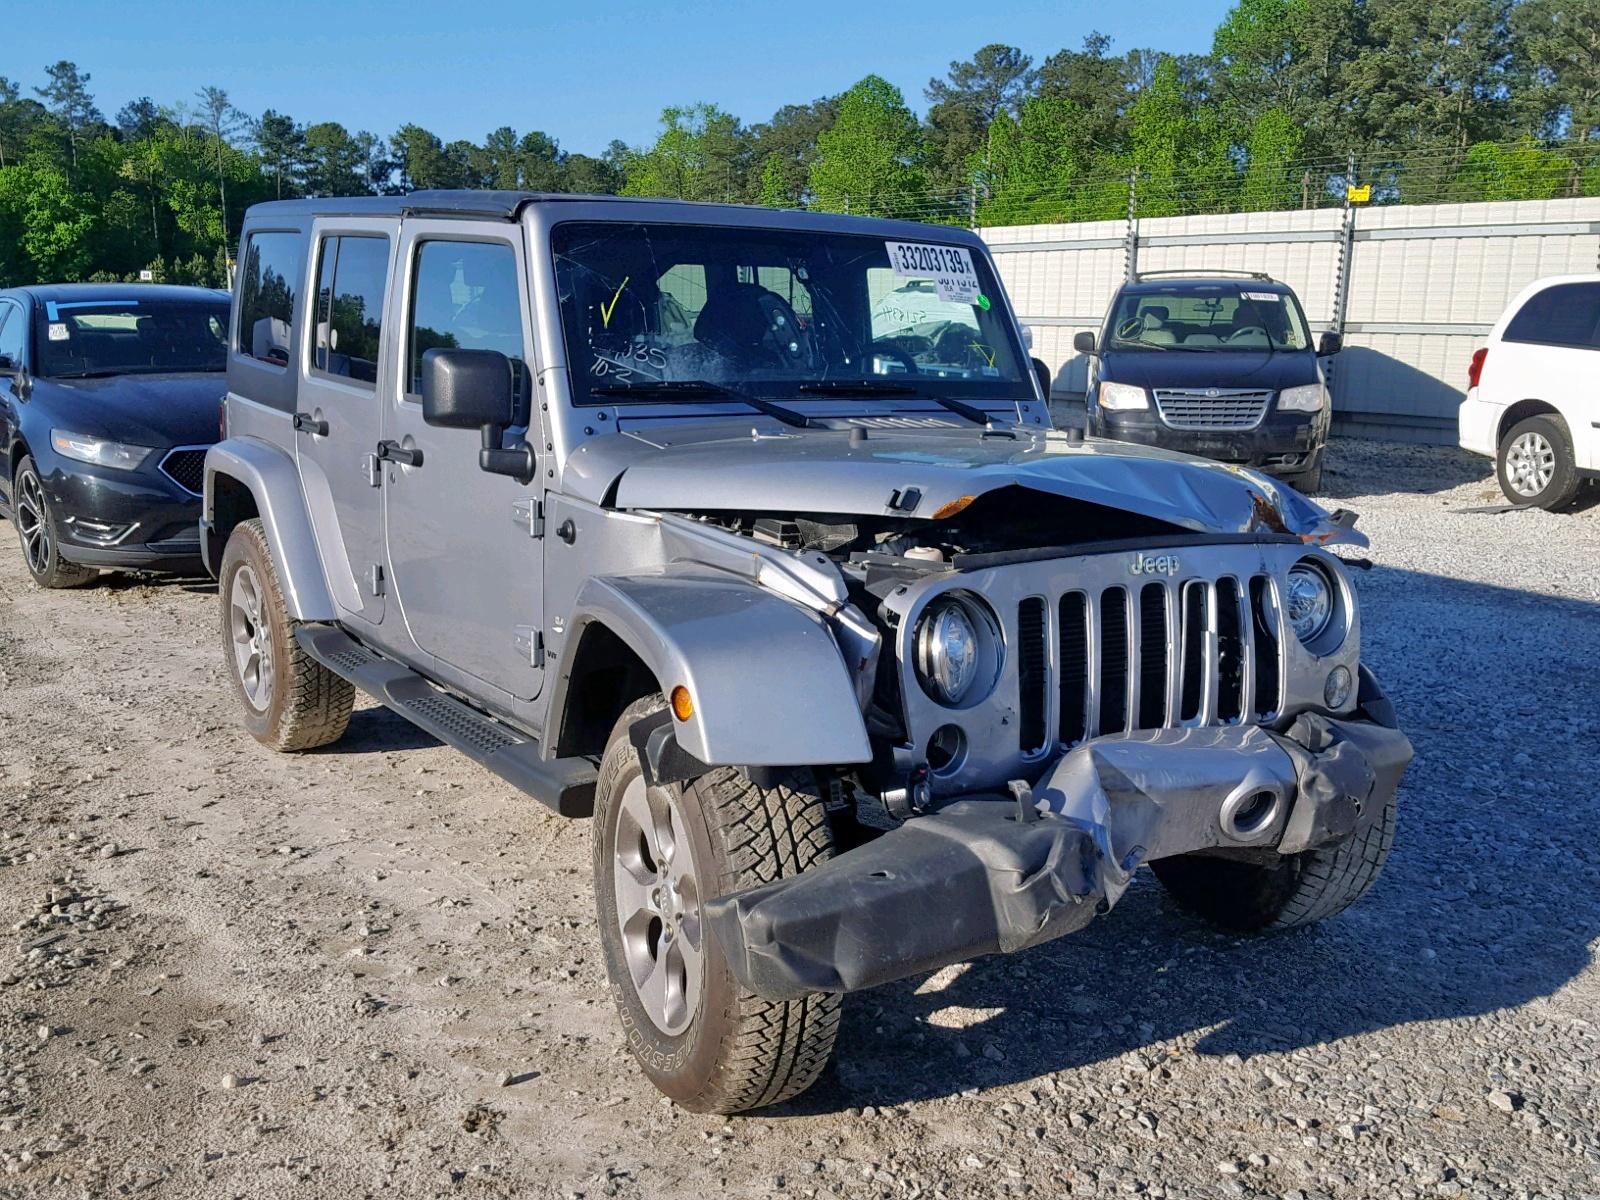 hight resolution of 1c4hjweg5jl922515 2018 jeep wrangler u 3 6l left view 1c4hjweg5jl922515